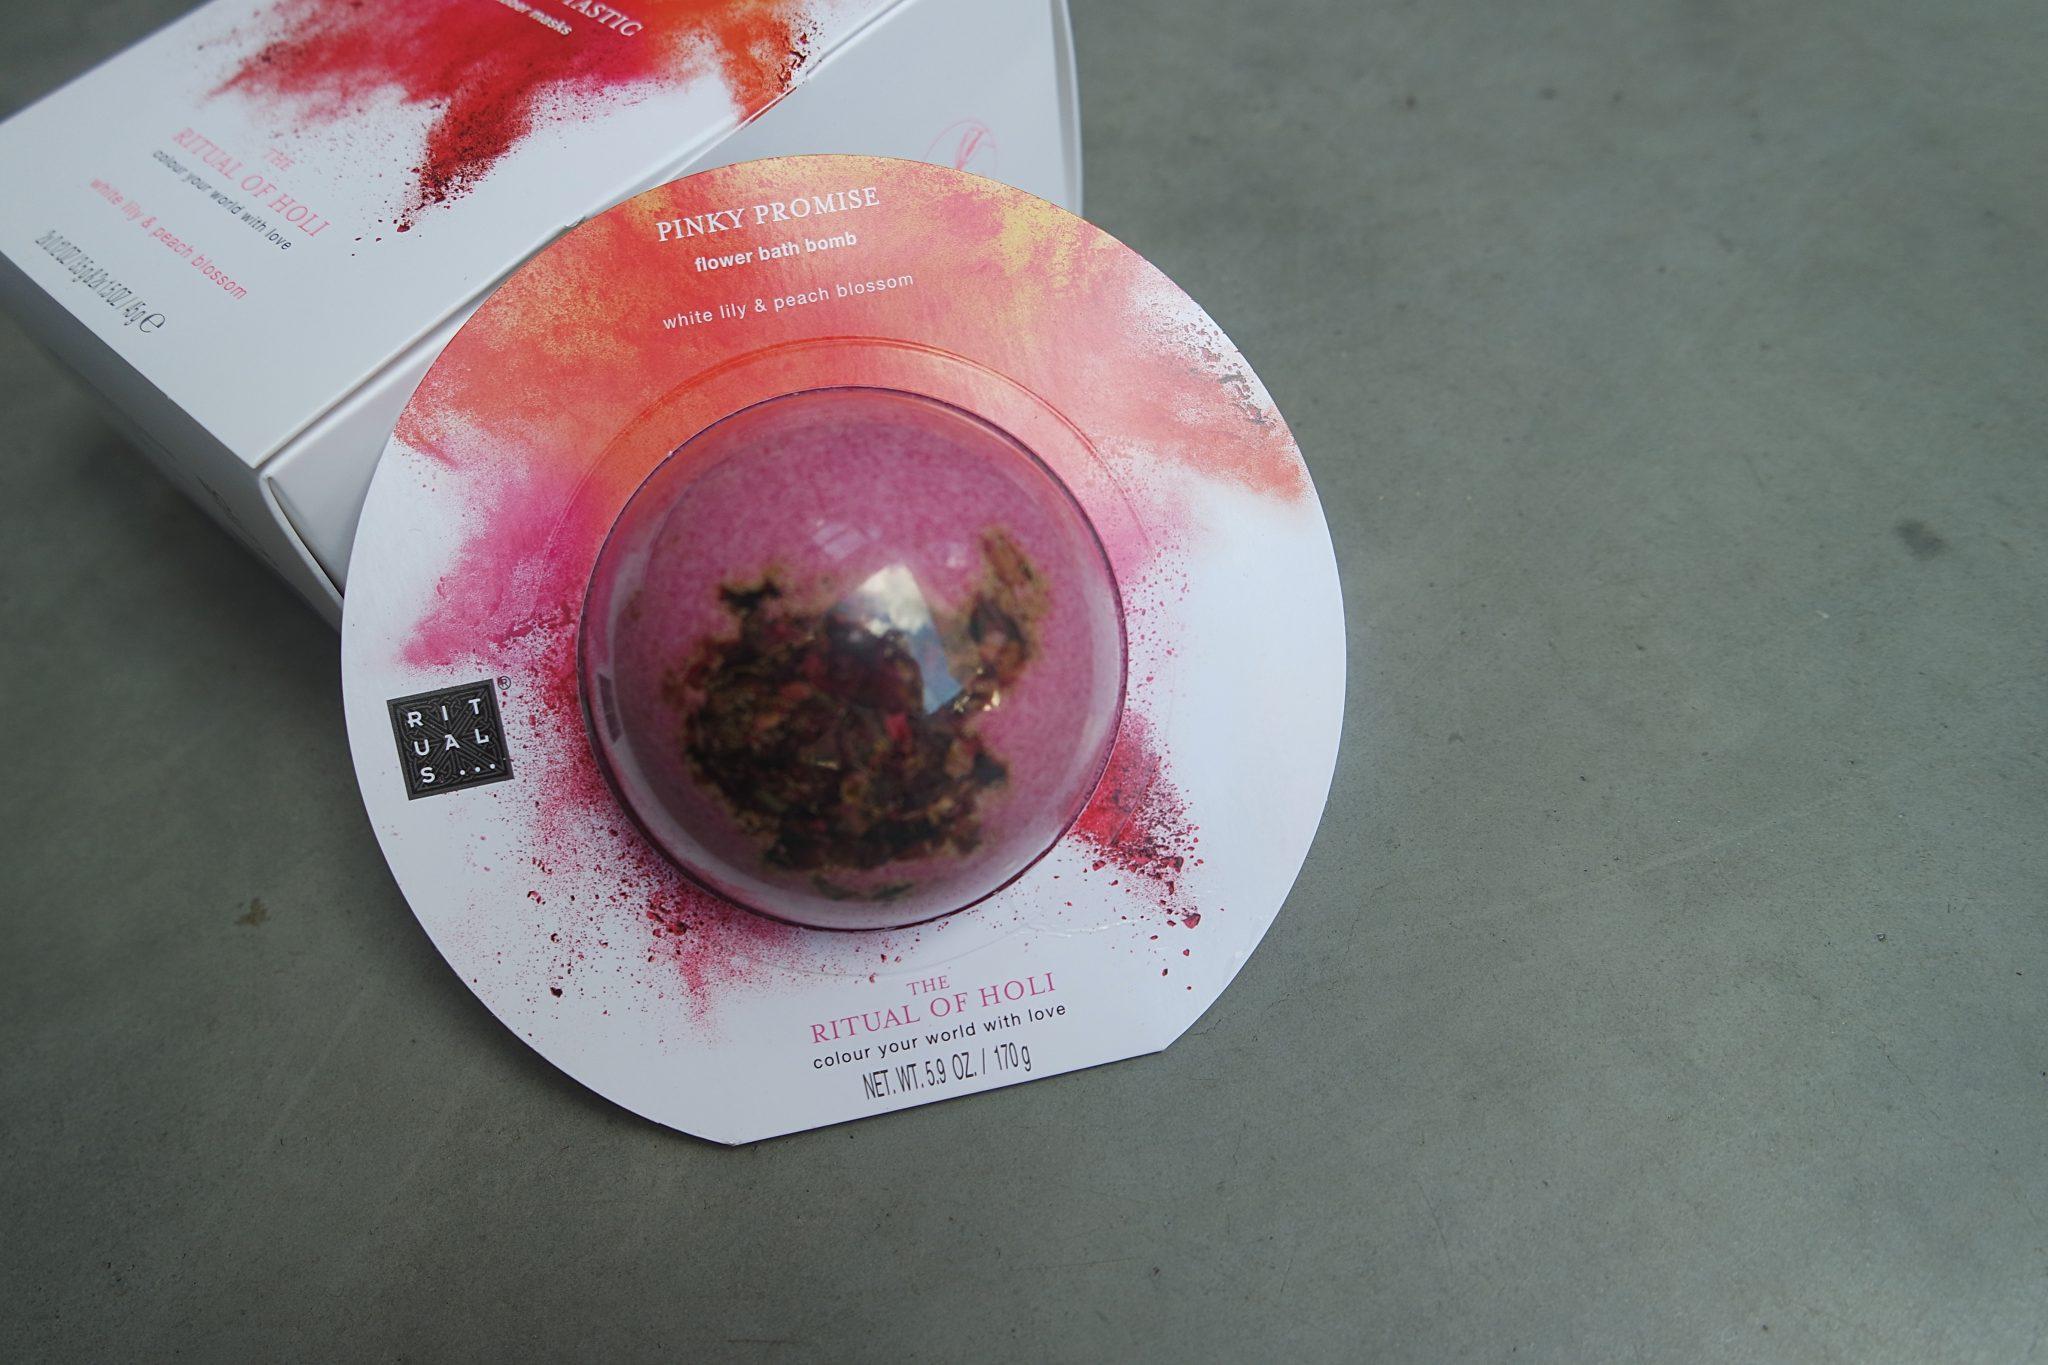 rituals bruisbal flower bath bomb pinky promise